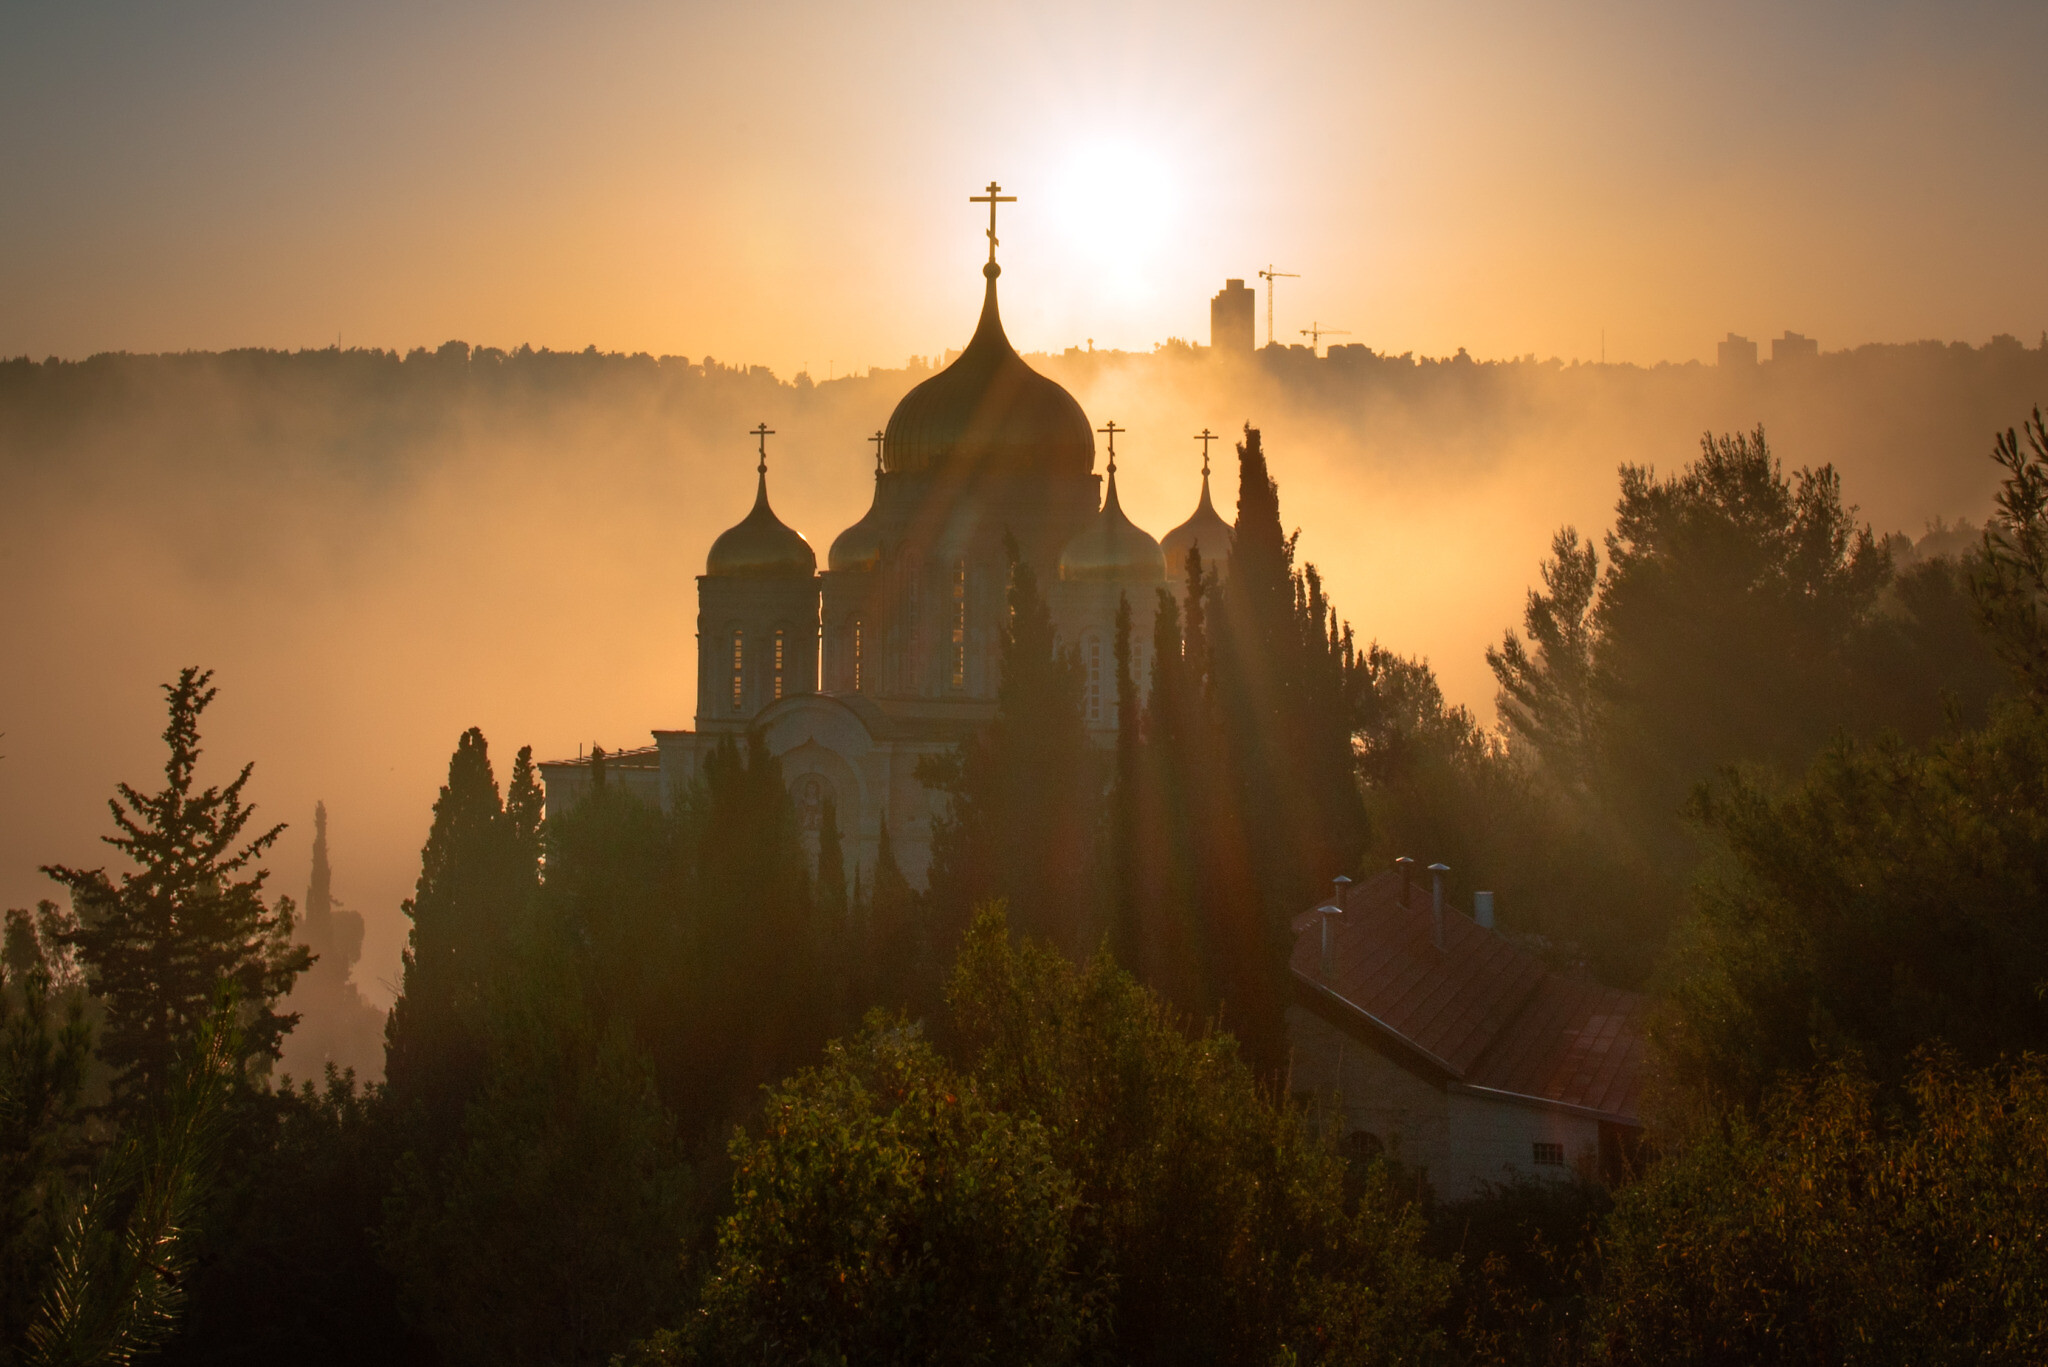 The sun rises over the Moscovia Monastery, in Ein Kerem, Jerusalem on July 31, 2020. (Mila Aviv/Flash90)